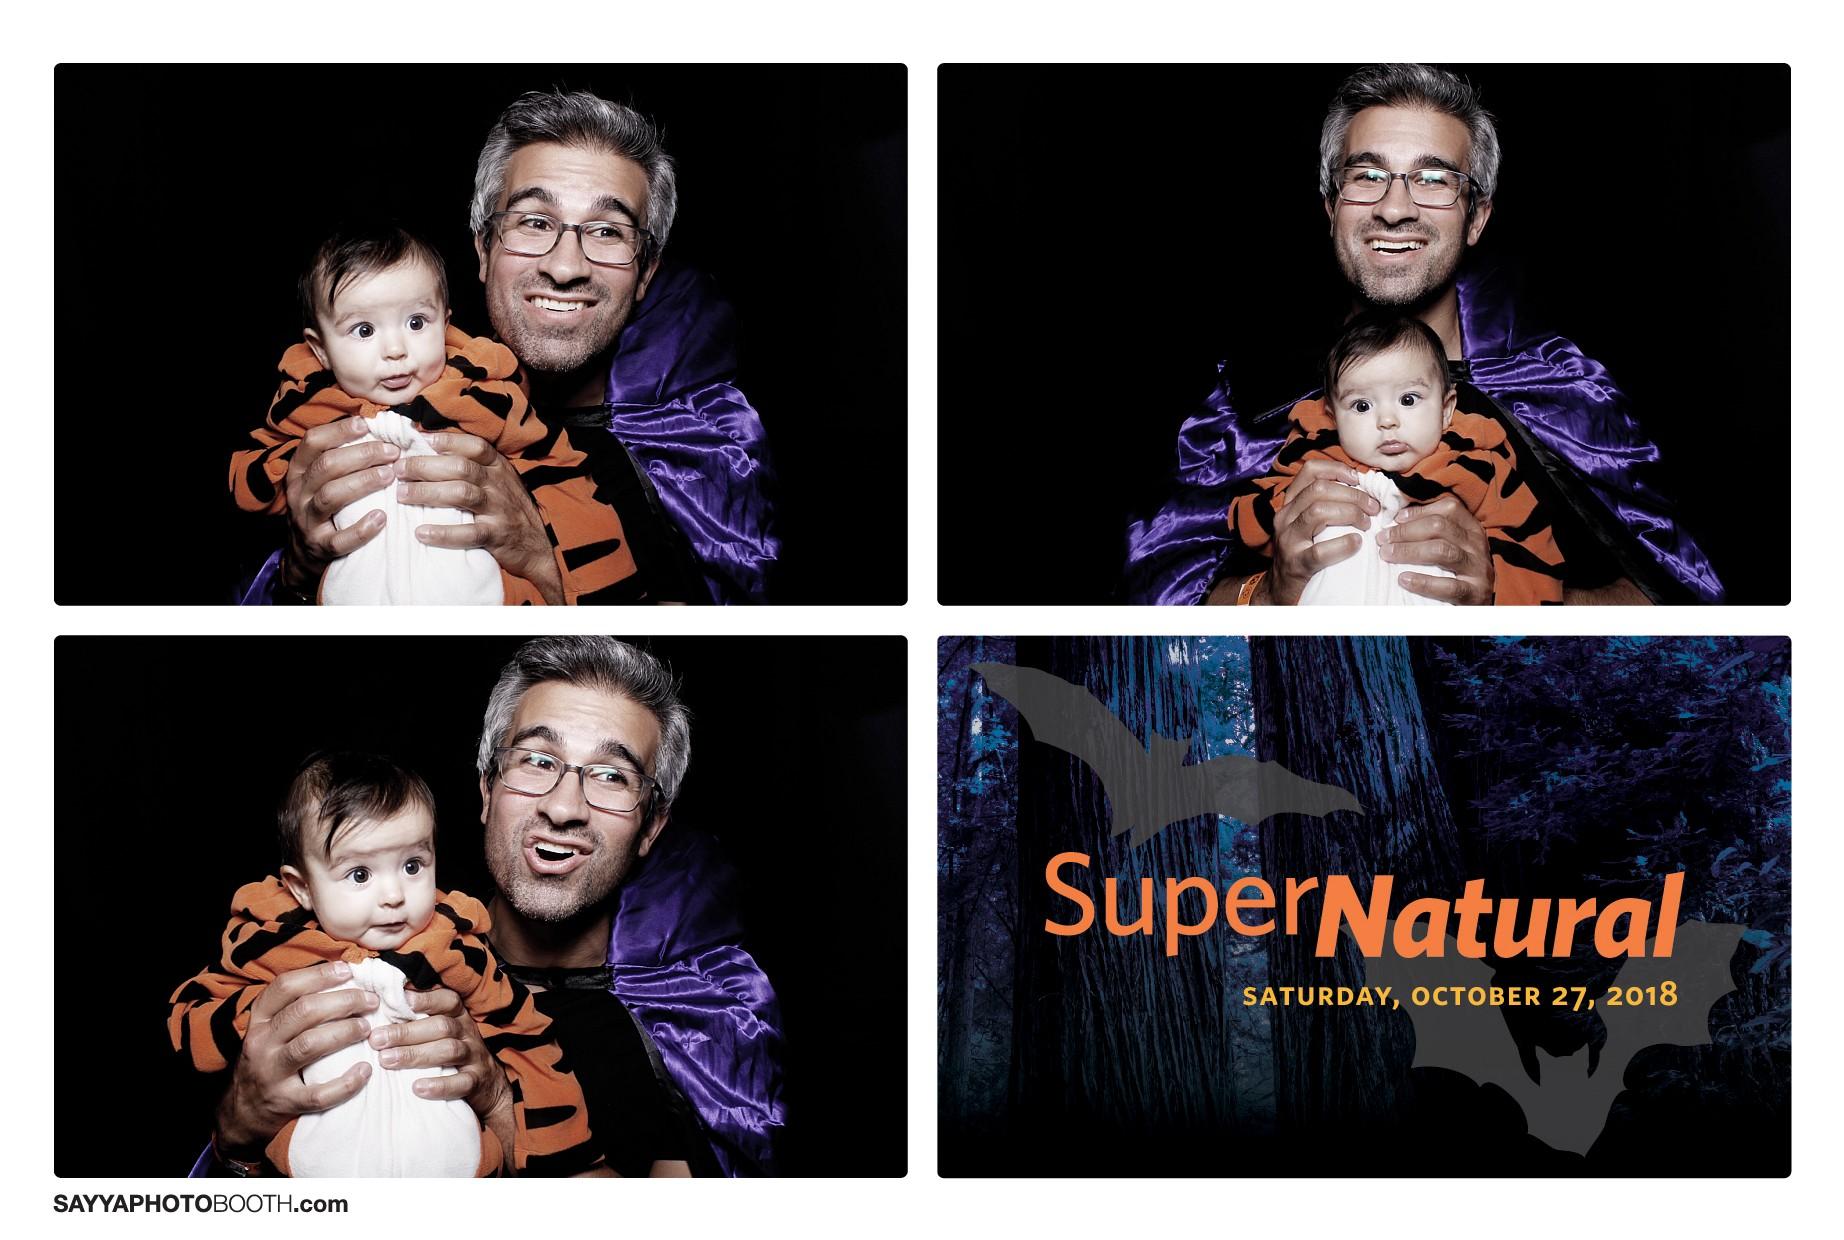 SuperNatural Halloween - Booth 1